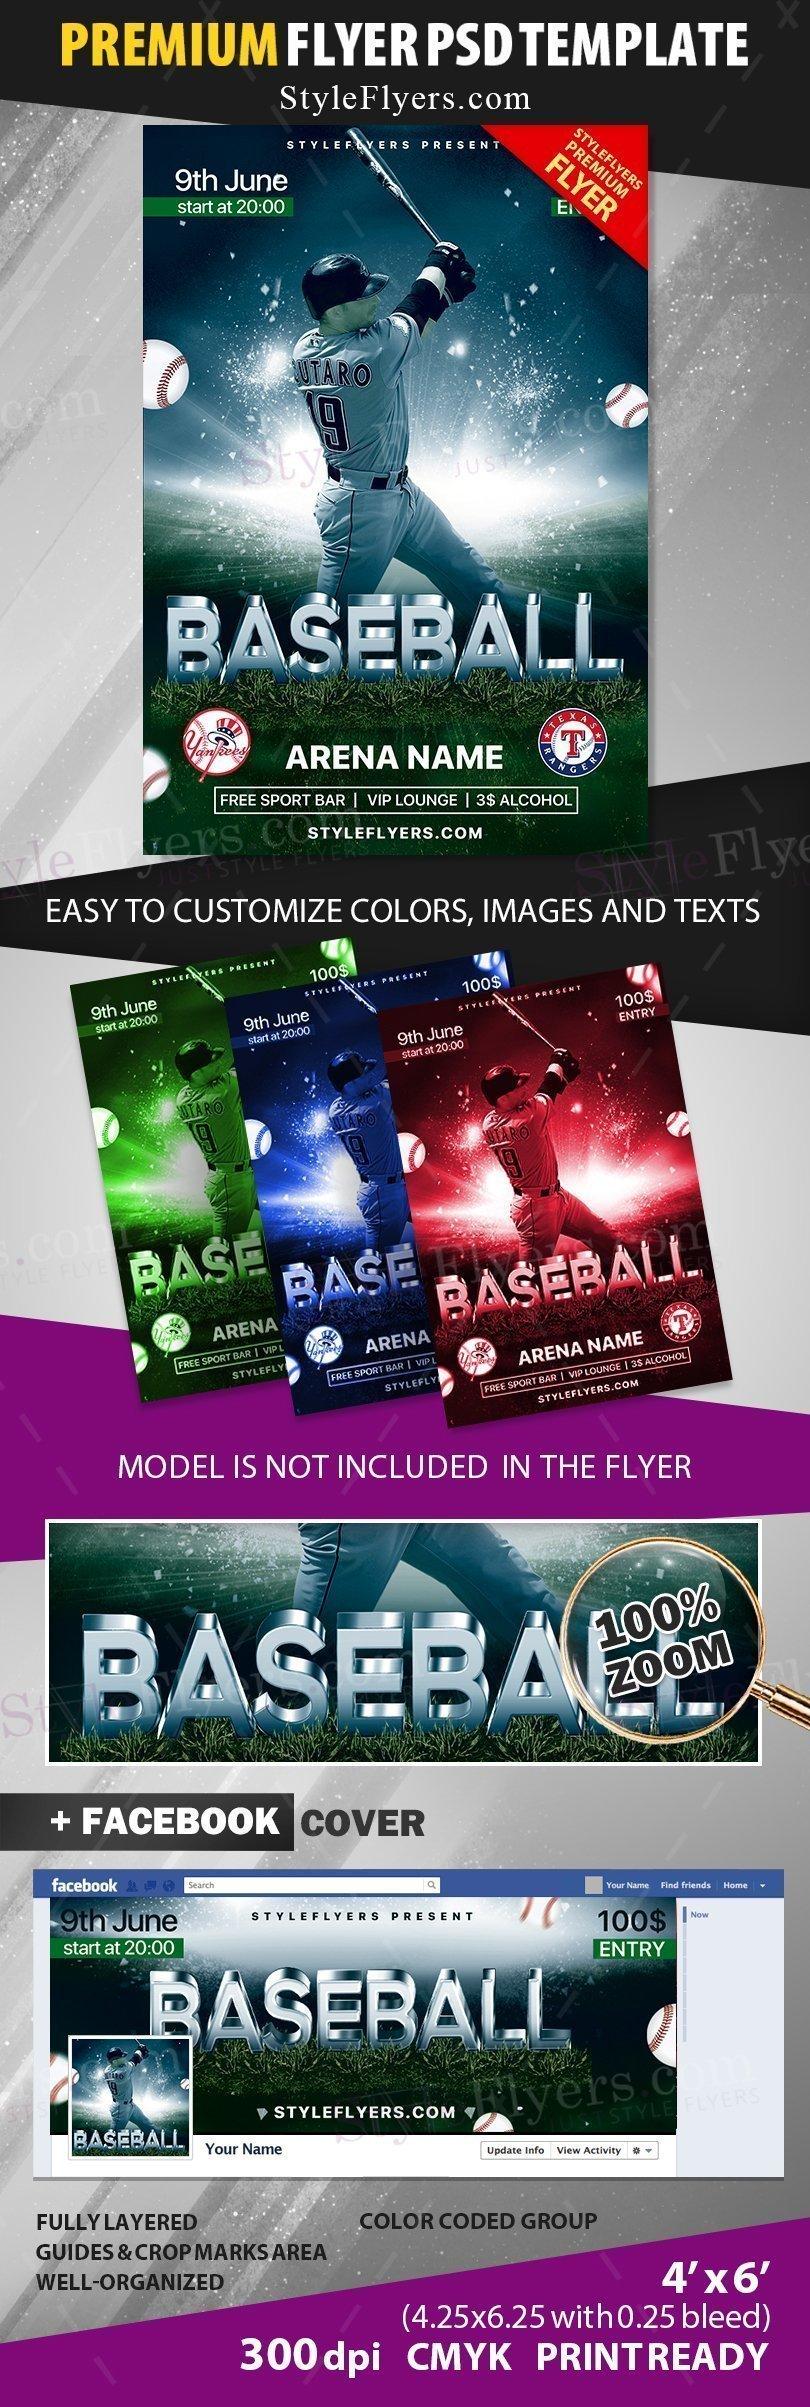 preview_baseball_psd_flyer